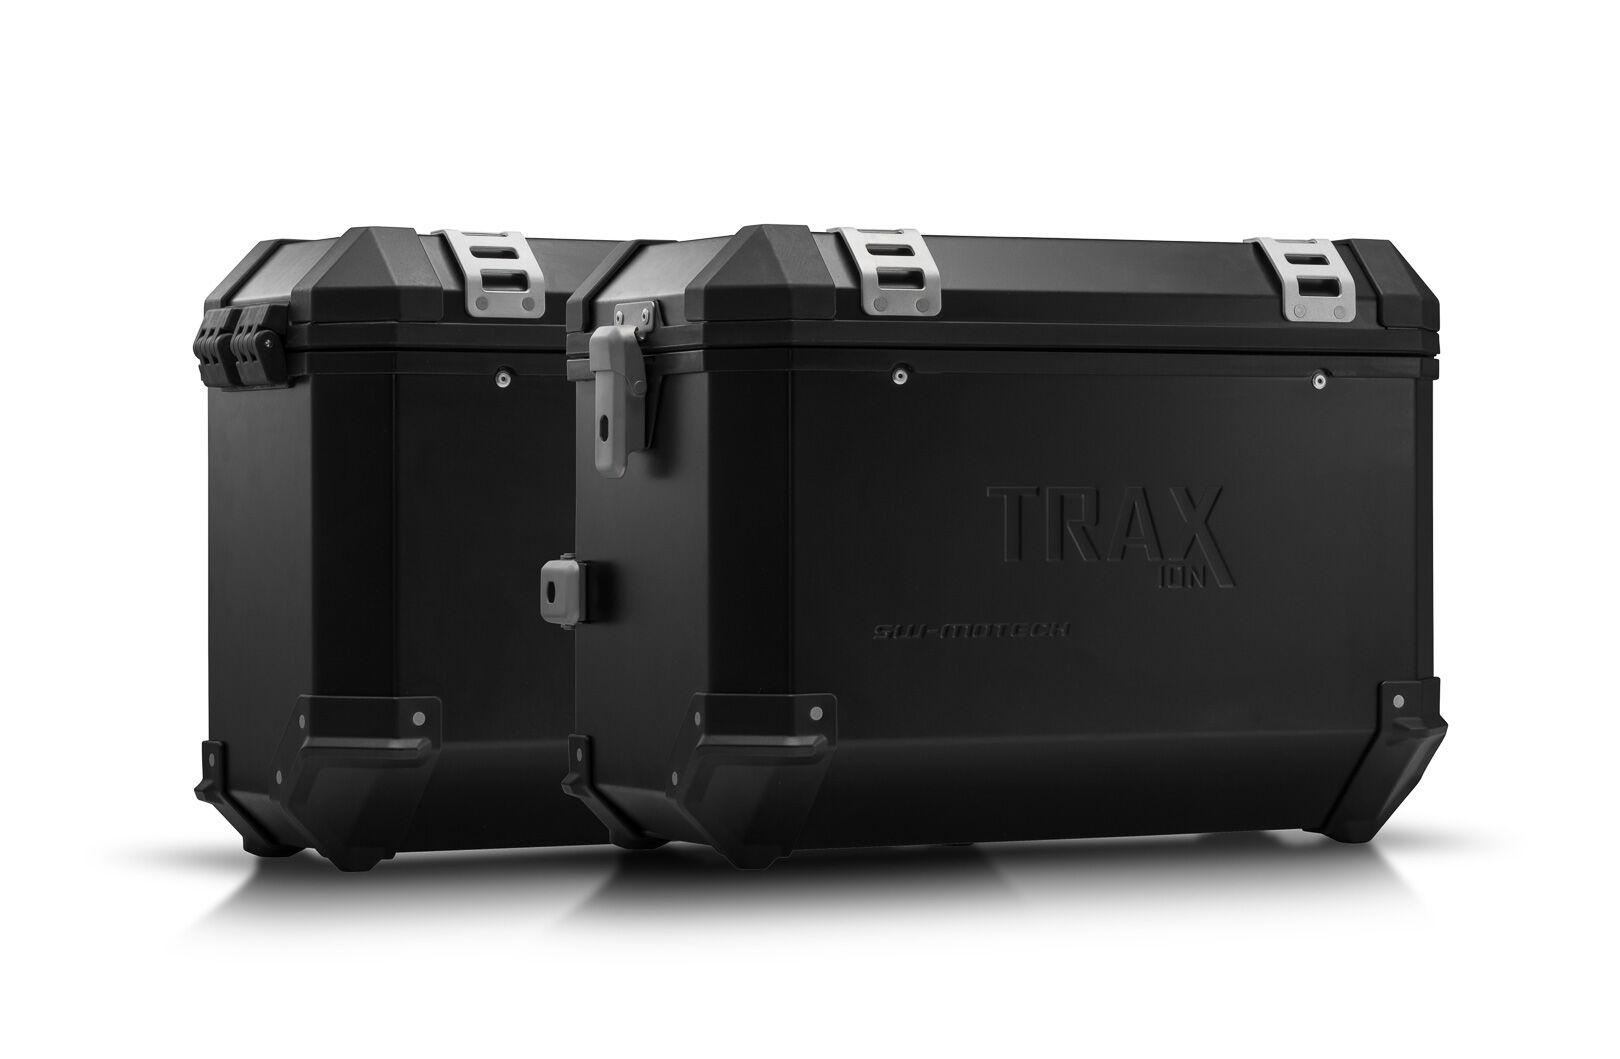 SW-Motech Sistema de maletas TRAX ION - Negro. 45/37 l. BMW F750GS, F850GS/Adv (17-).